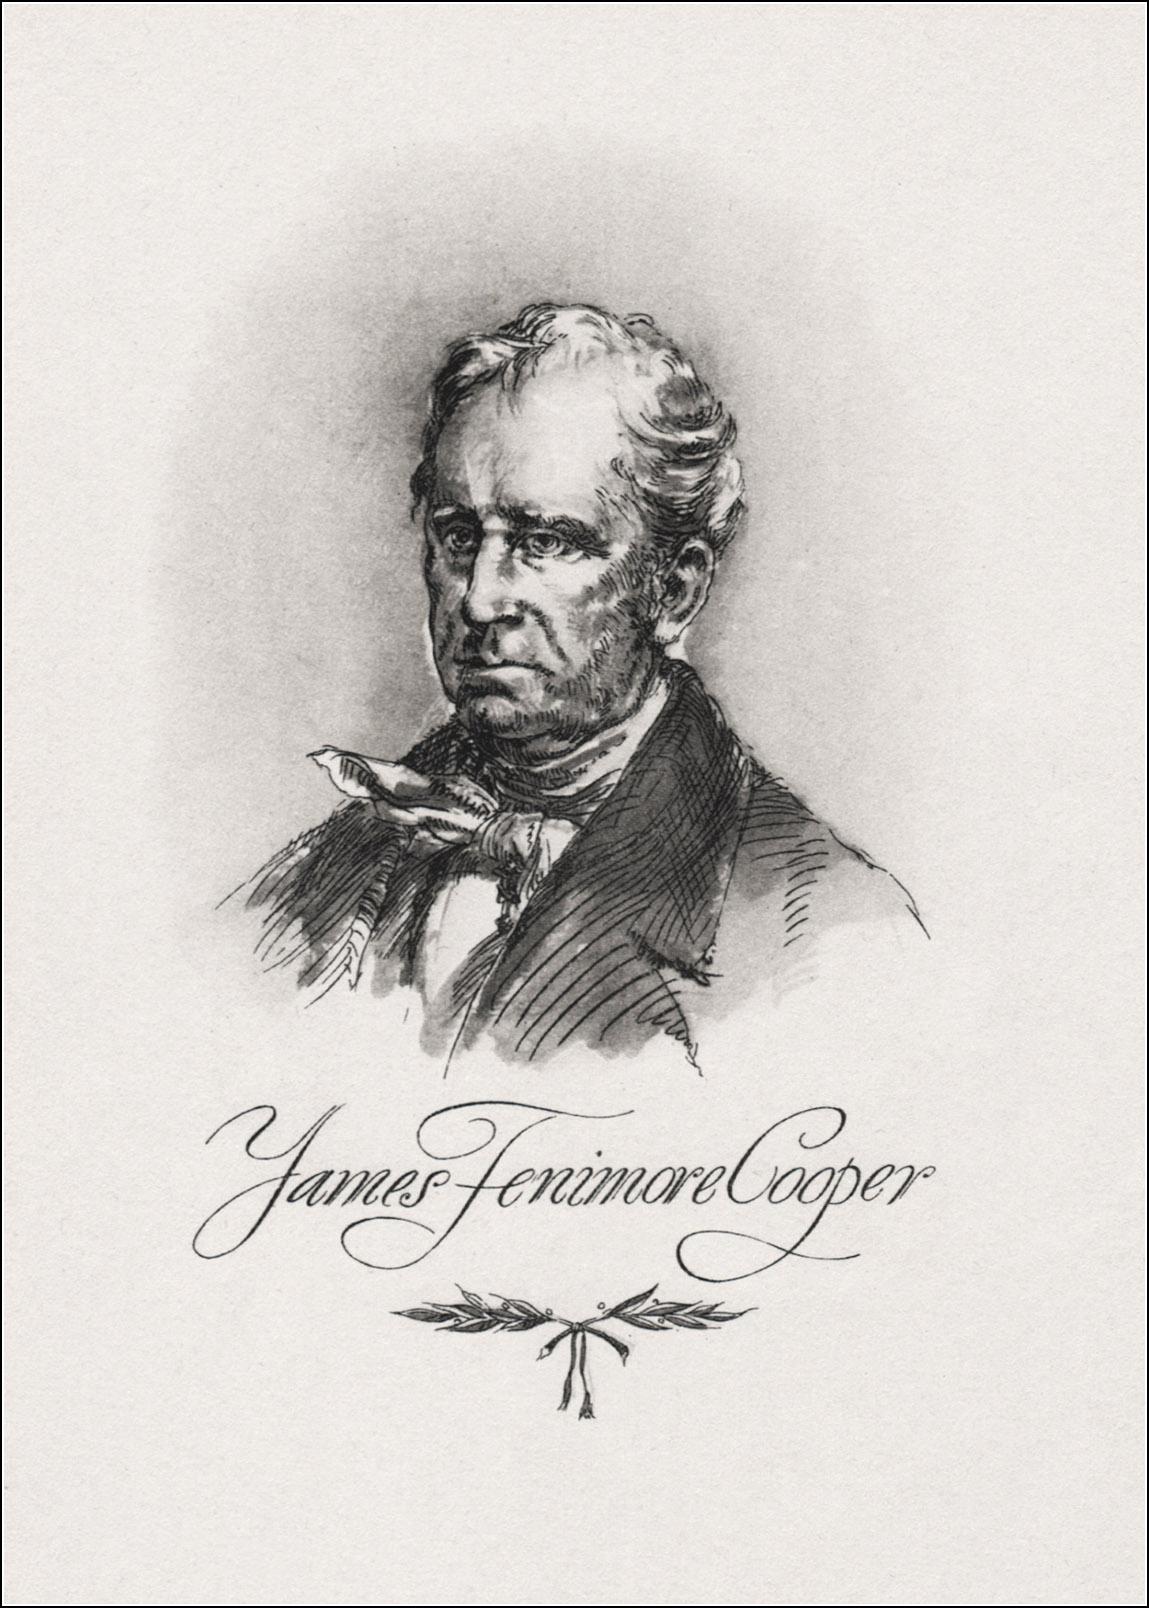 Gerhard Gossmann, Wildtöter